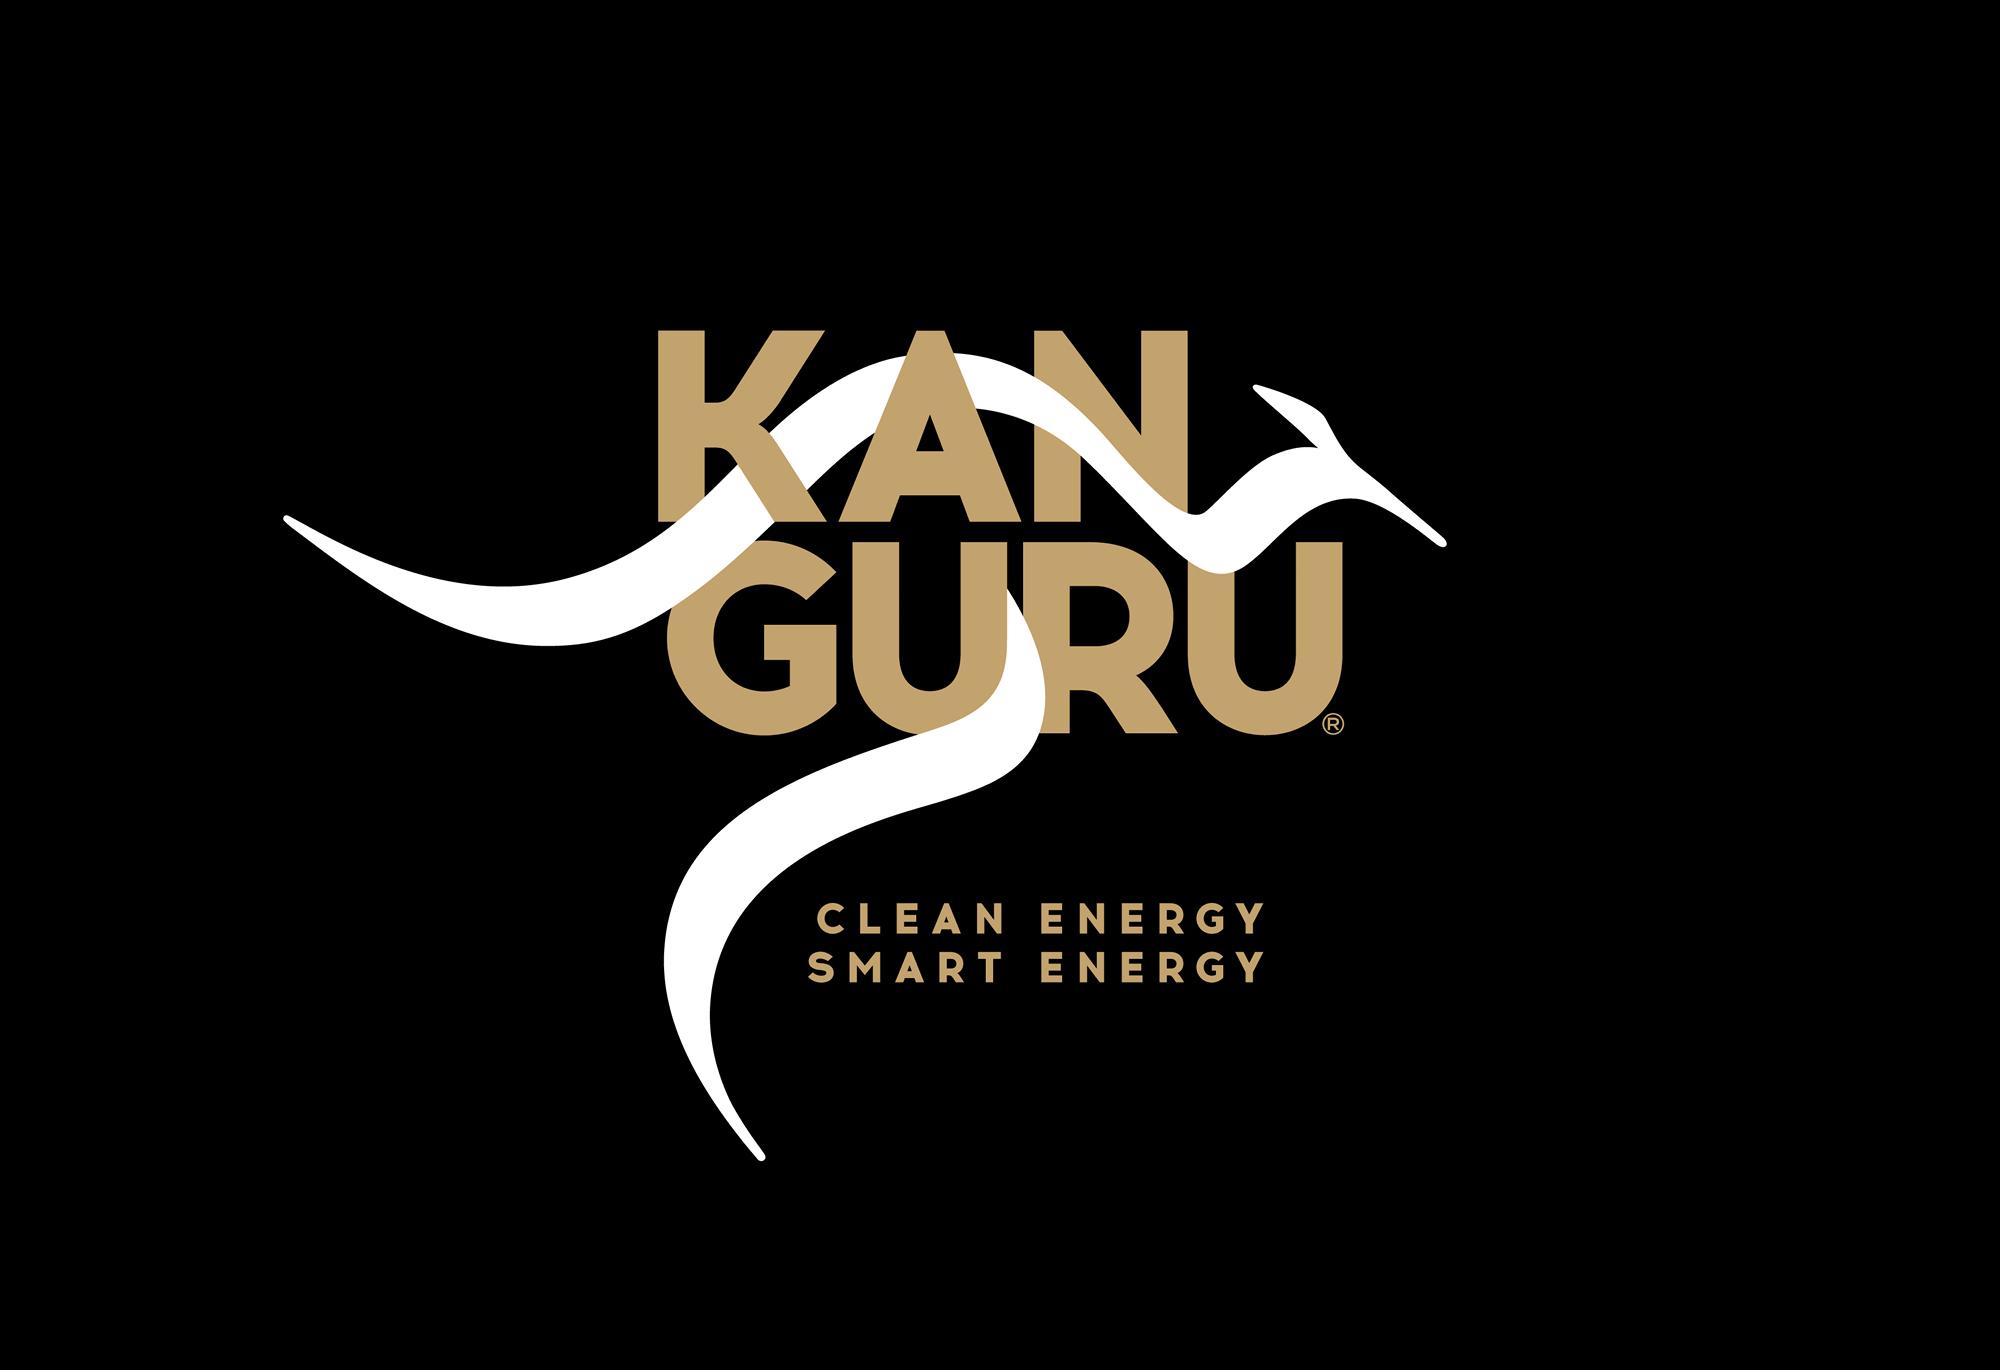 Kanguru – Clean Energy Smart Energy logo